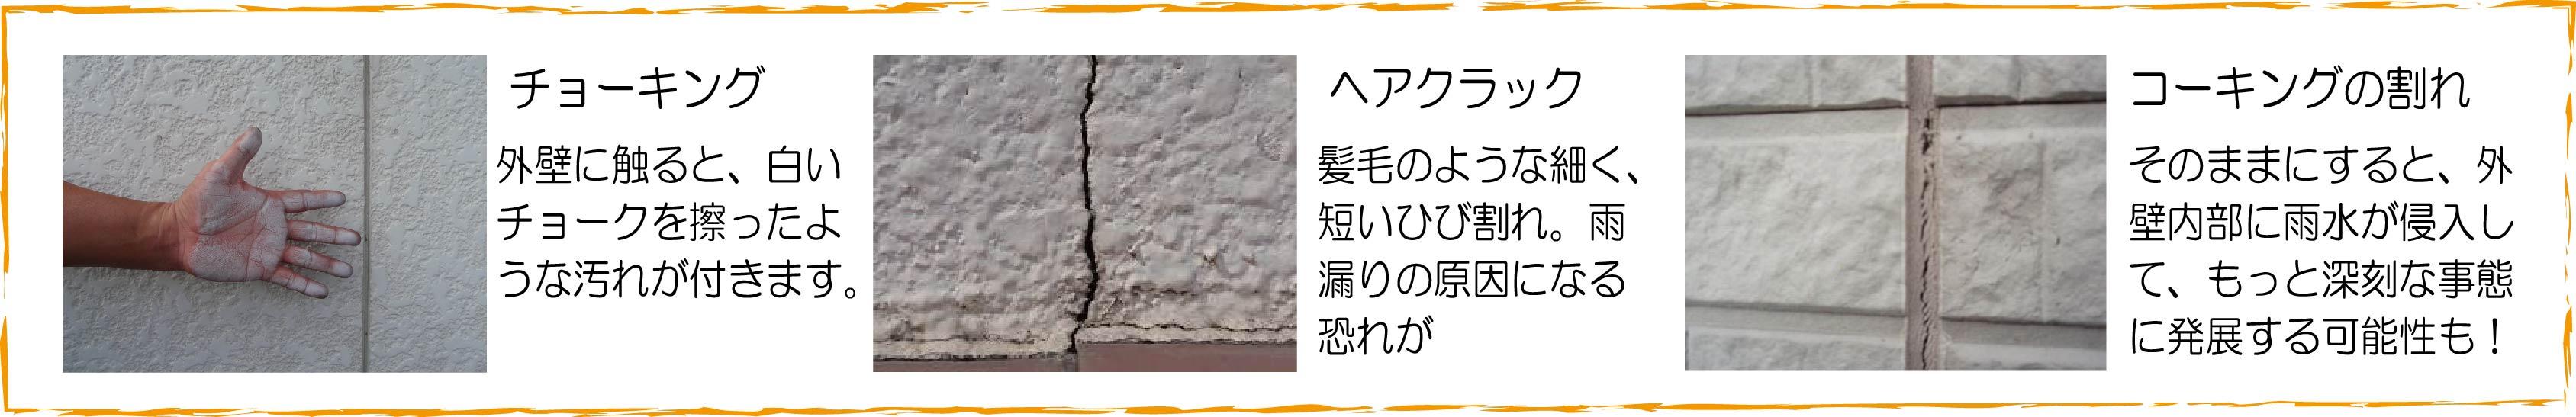 KuraSi-natu-sin83-18.jpg